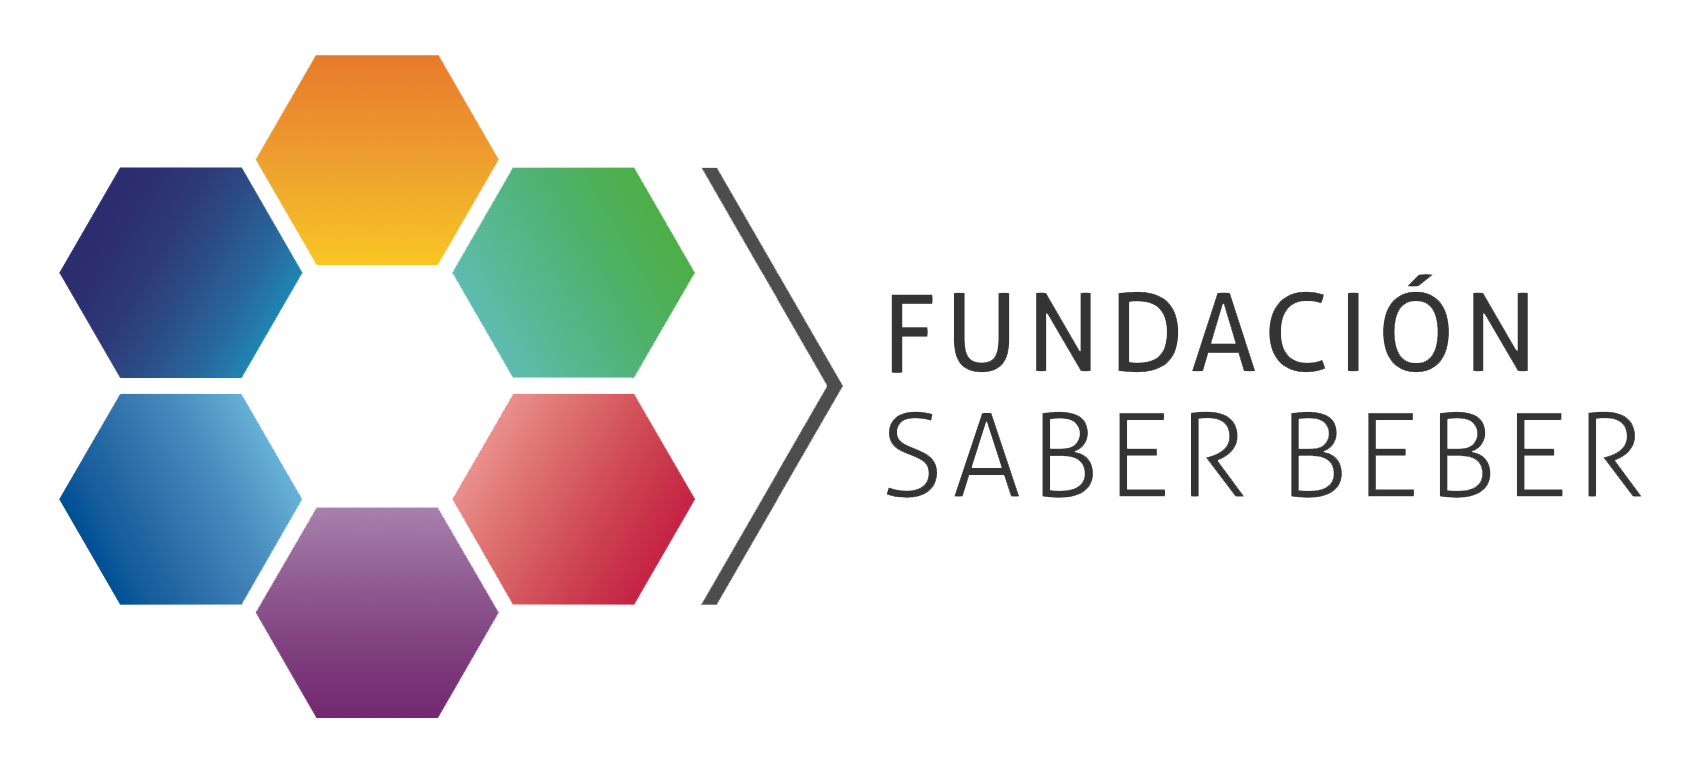 Fundación Saber Beber